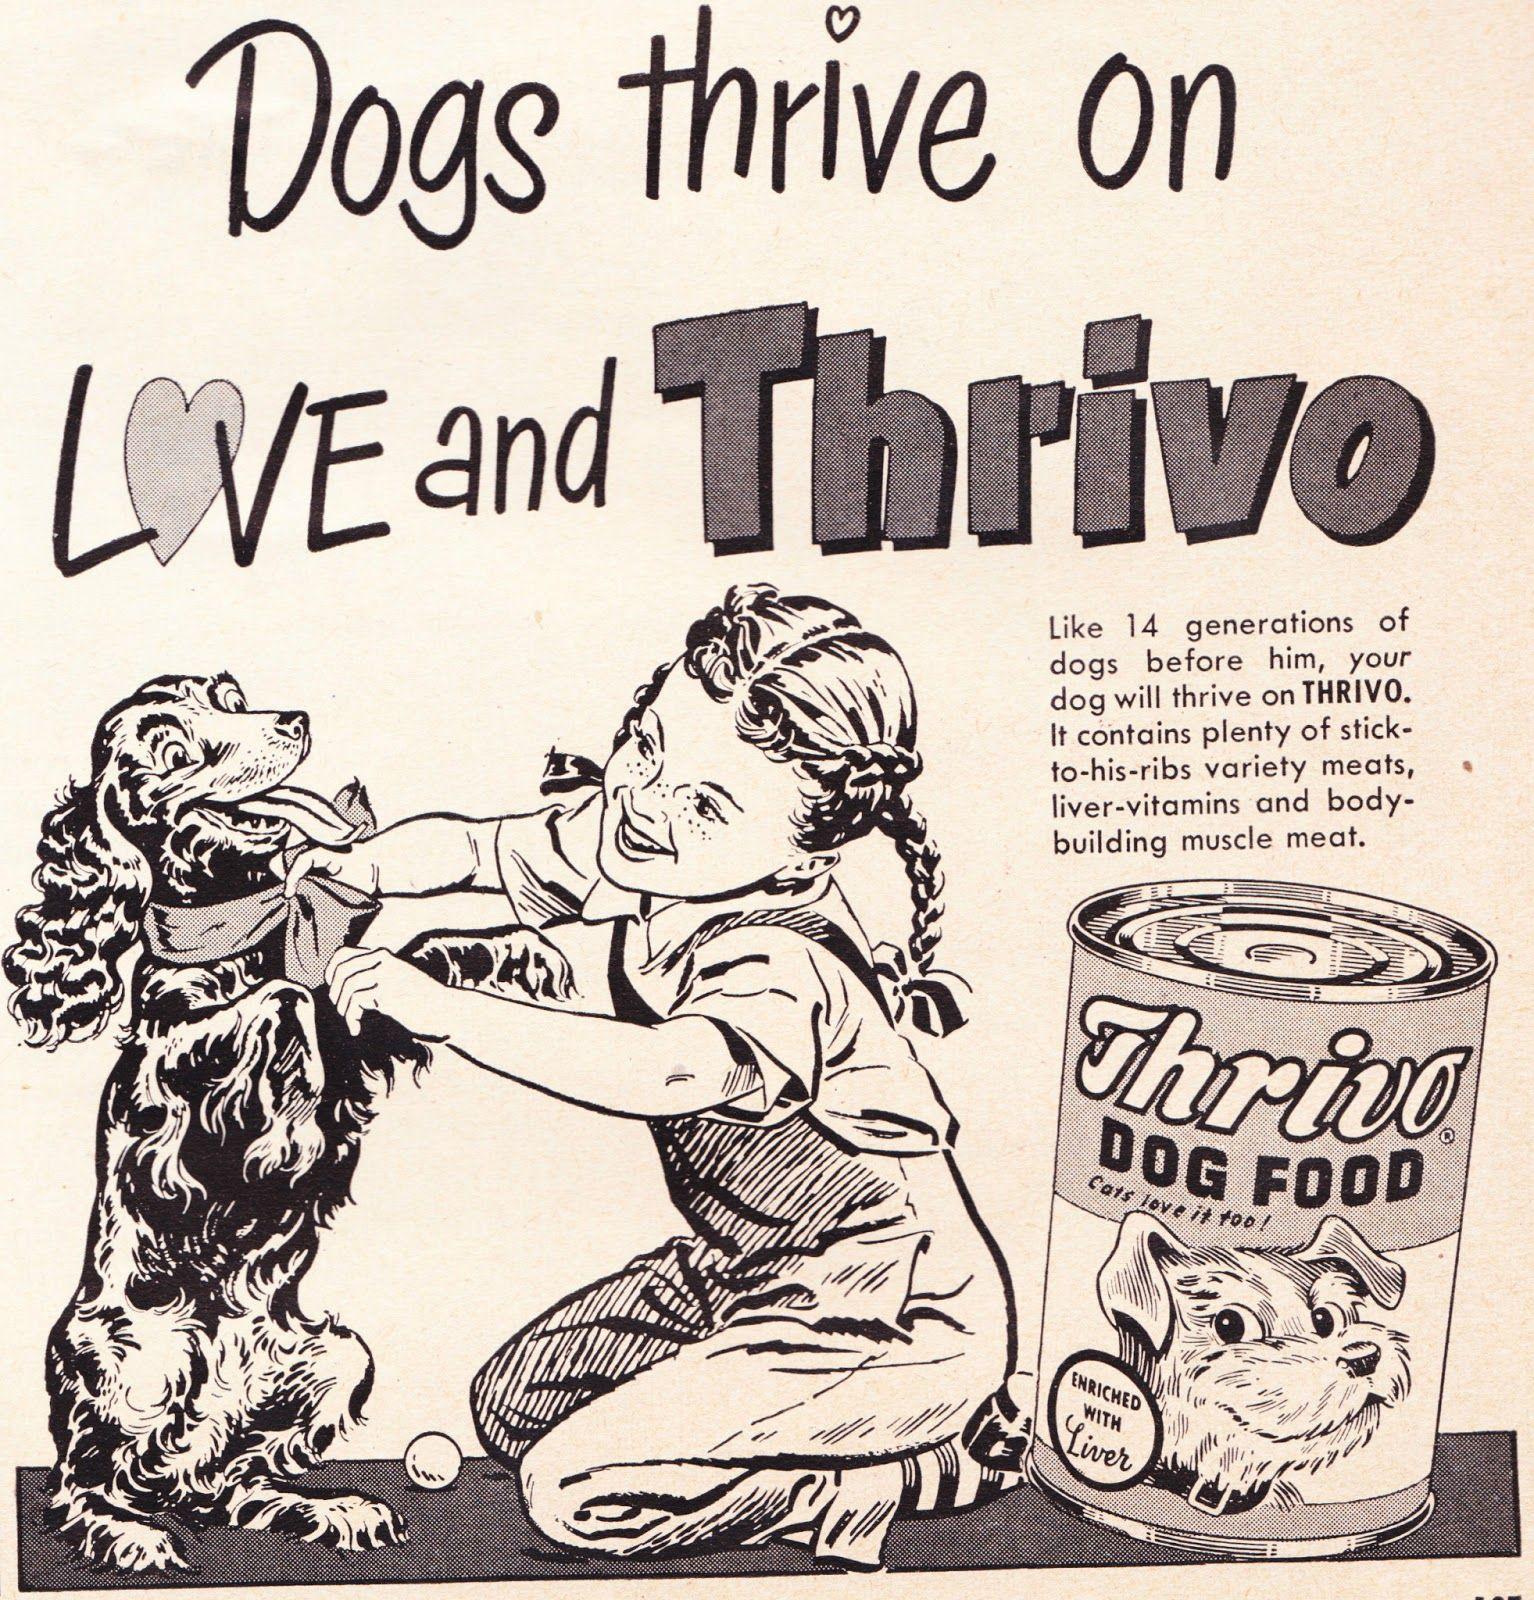 Thrivo Dog Food